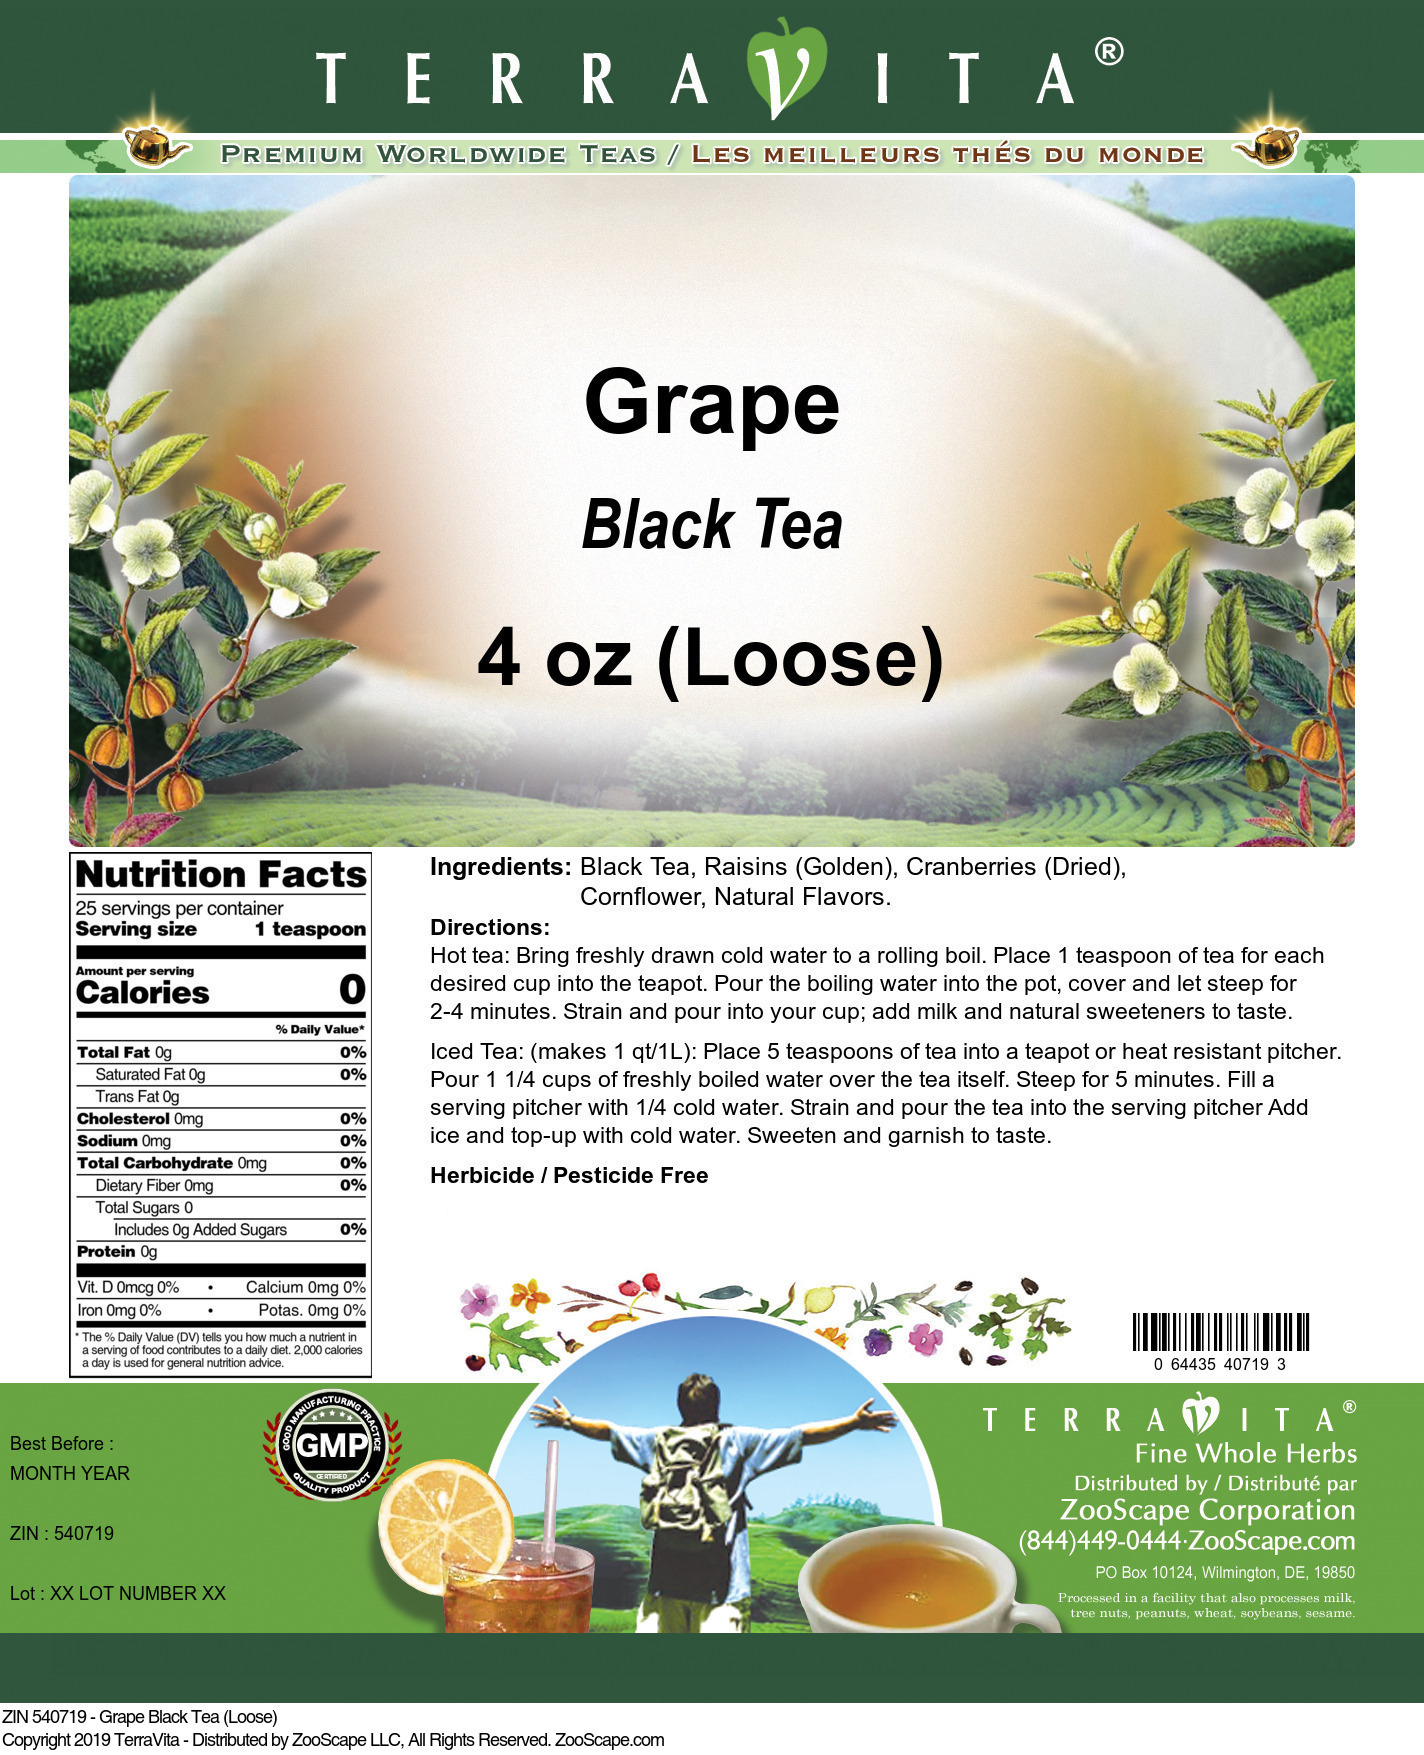 Grape Black Tea (Loose)